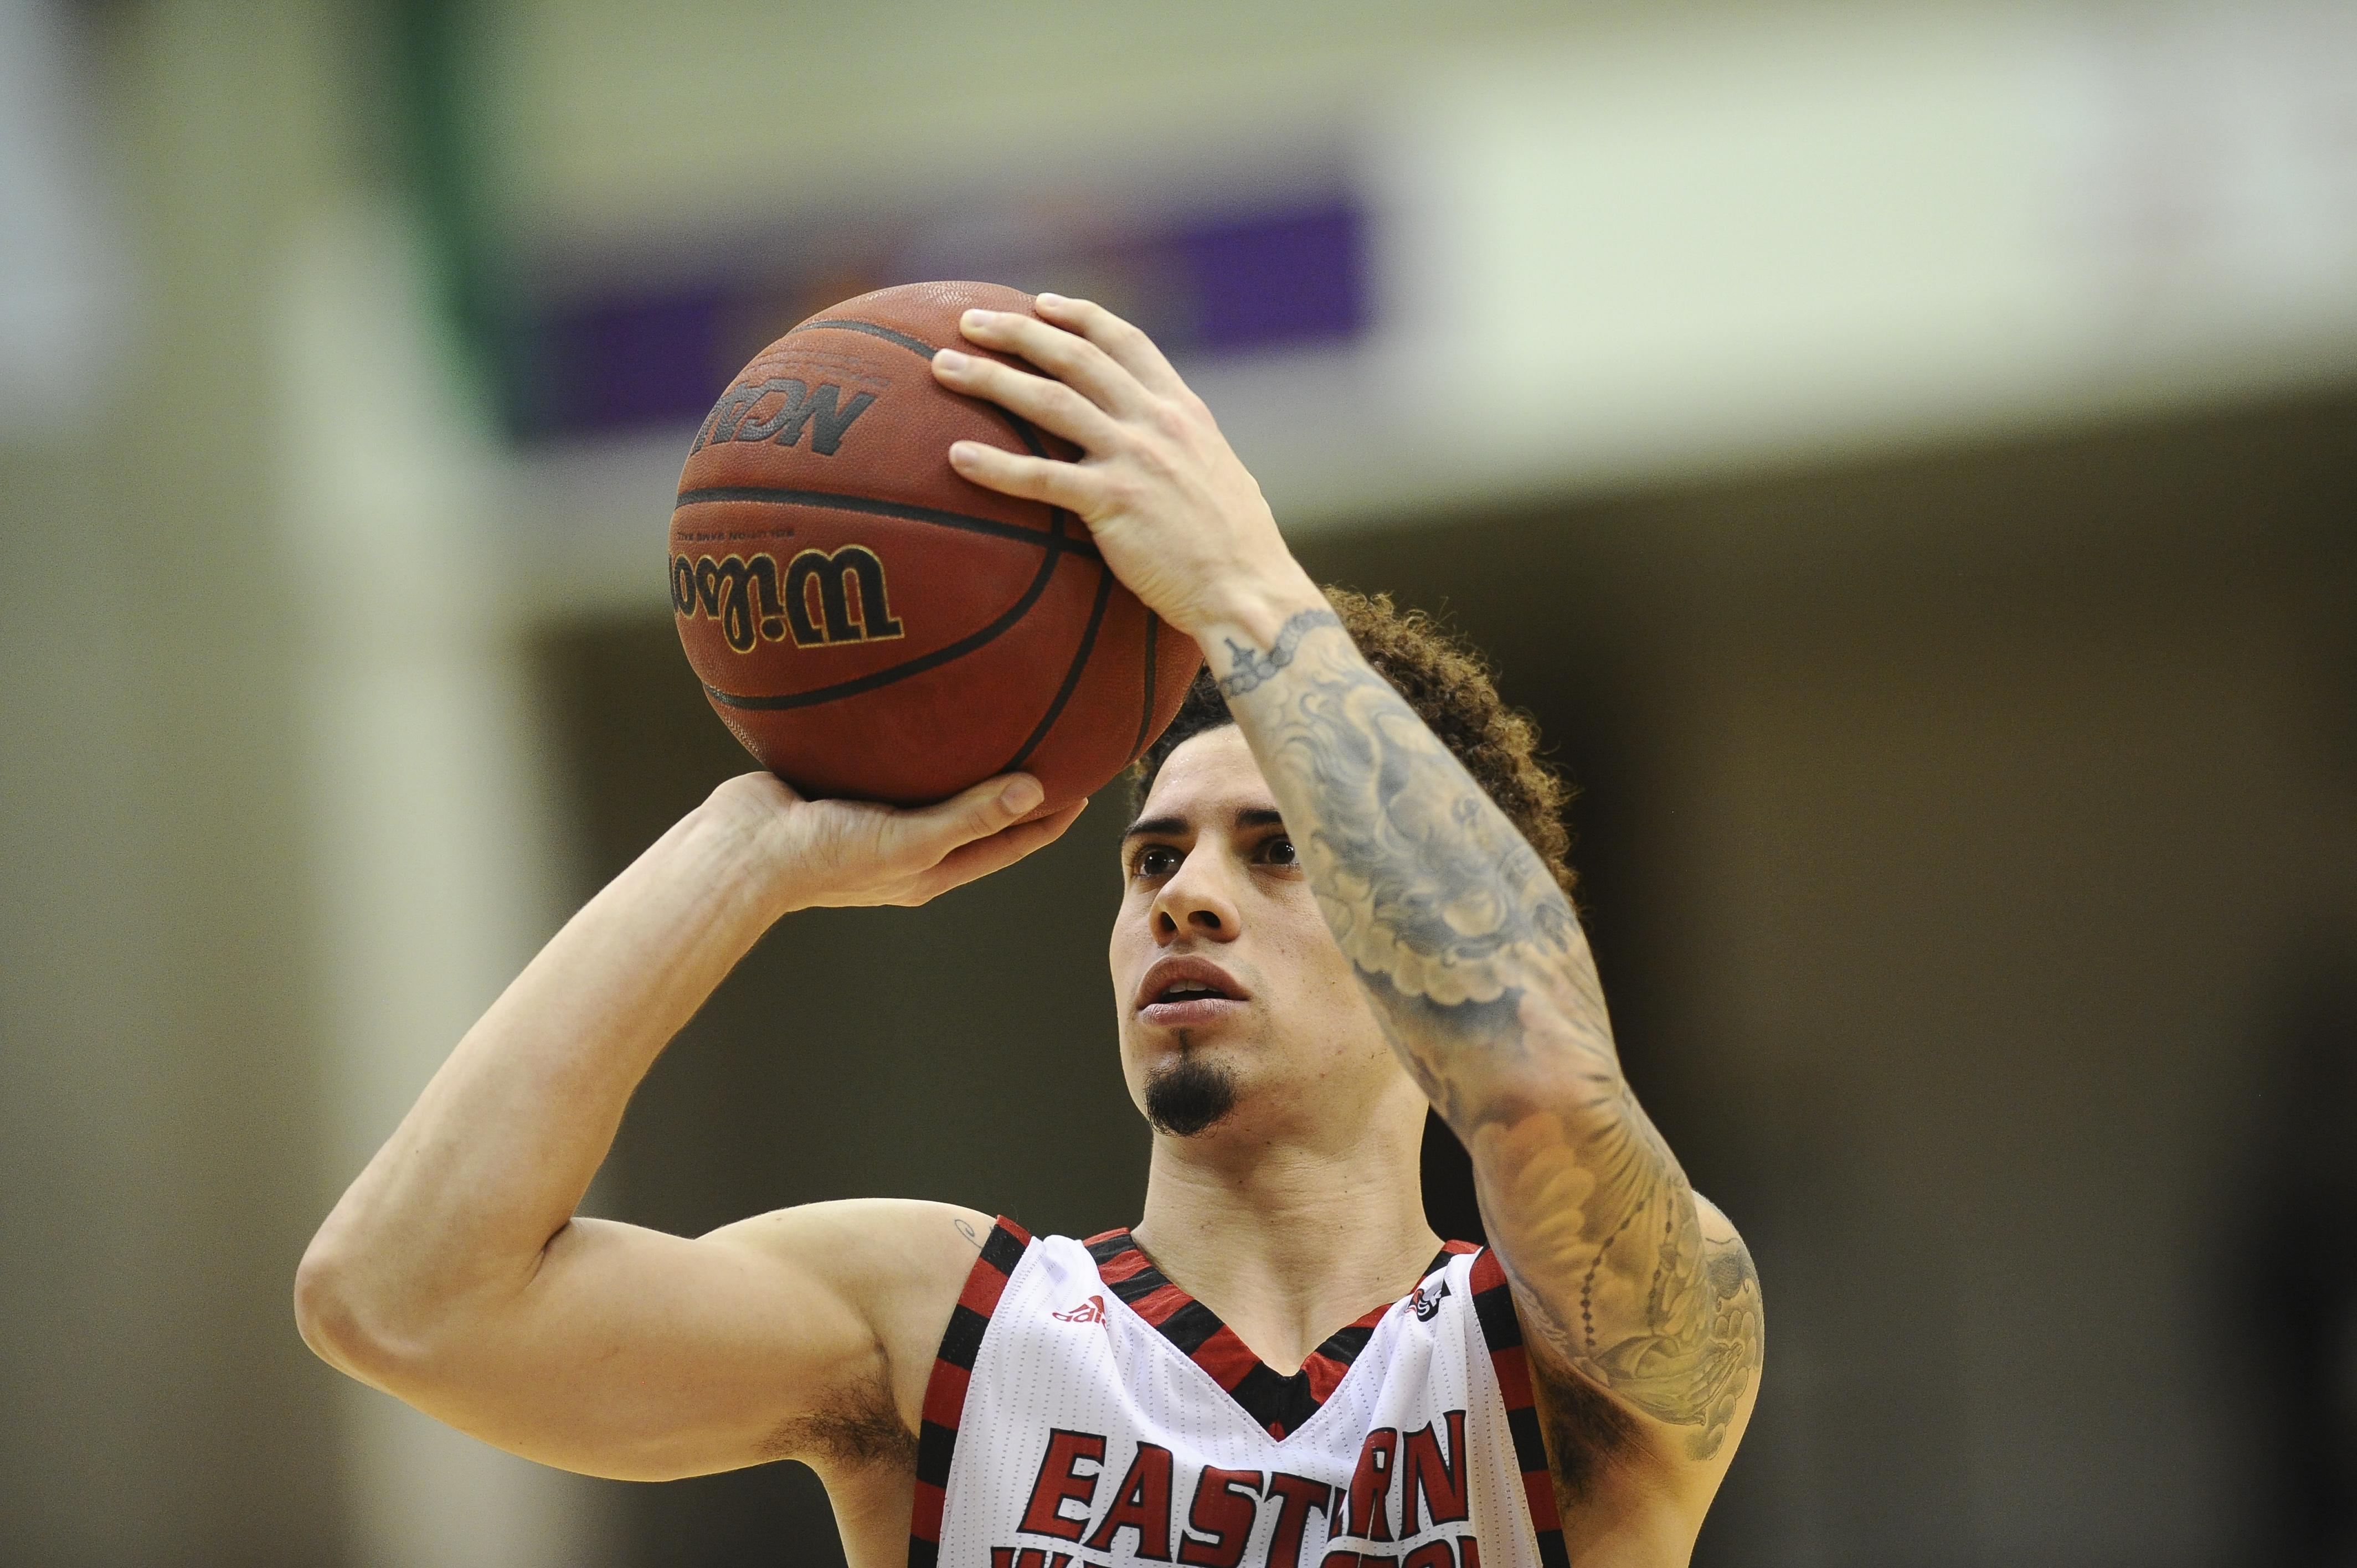 Saint Catherine University >> Austin McBroom gives Eastern unexpected scoring surge | The Spokesman-Review